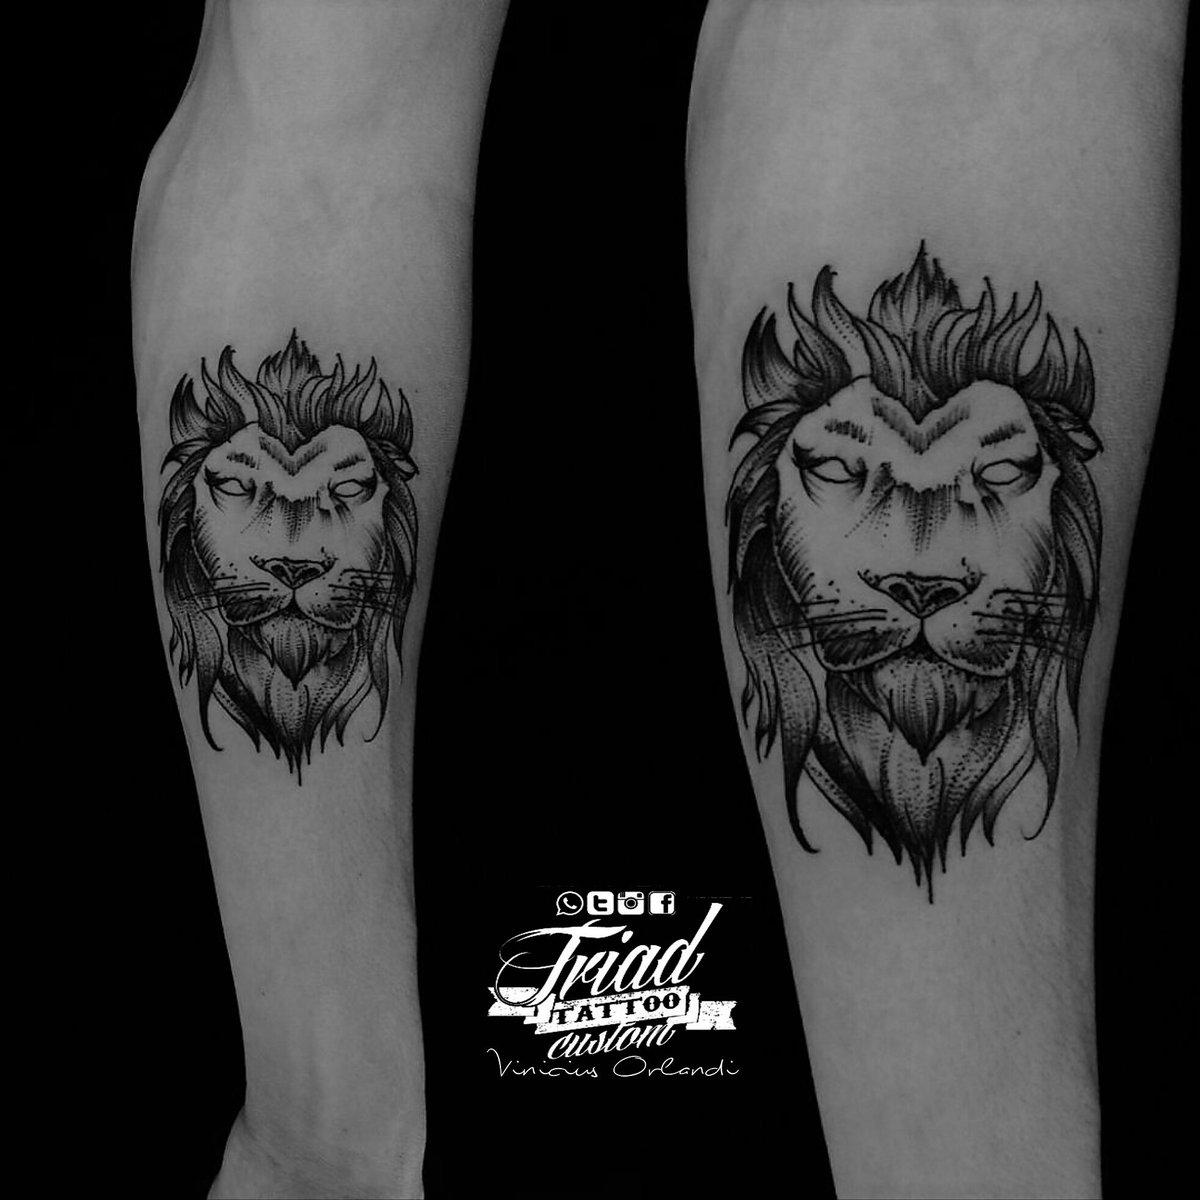 Rosenkrans tattoo